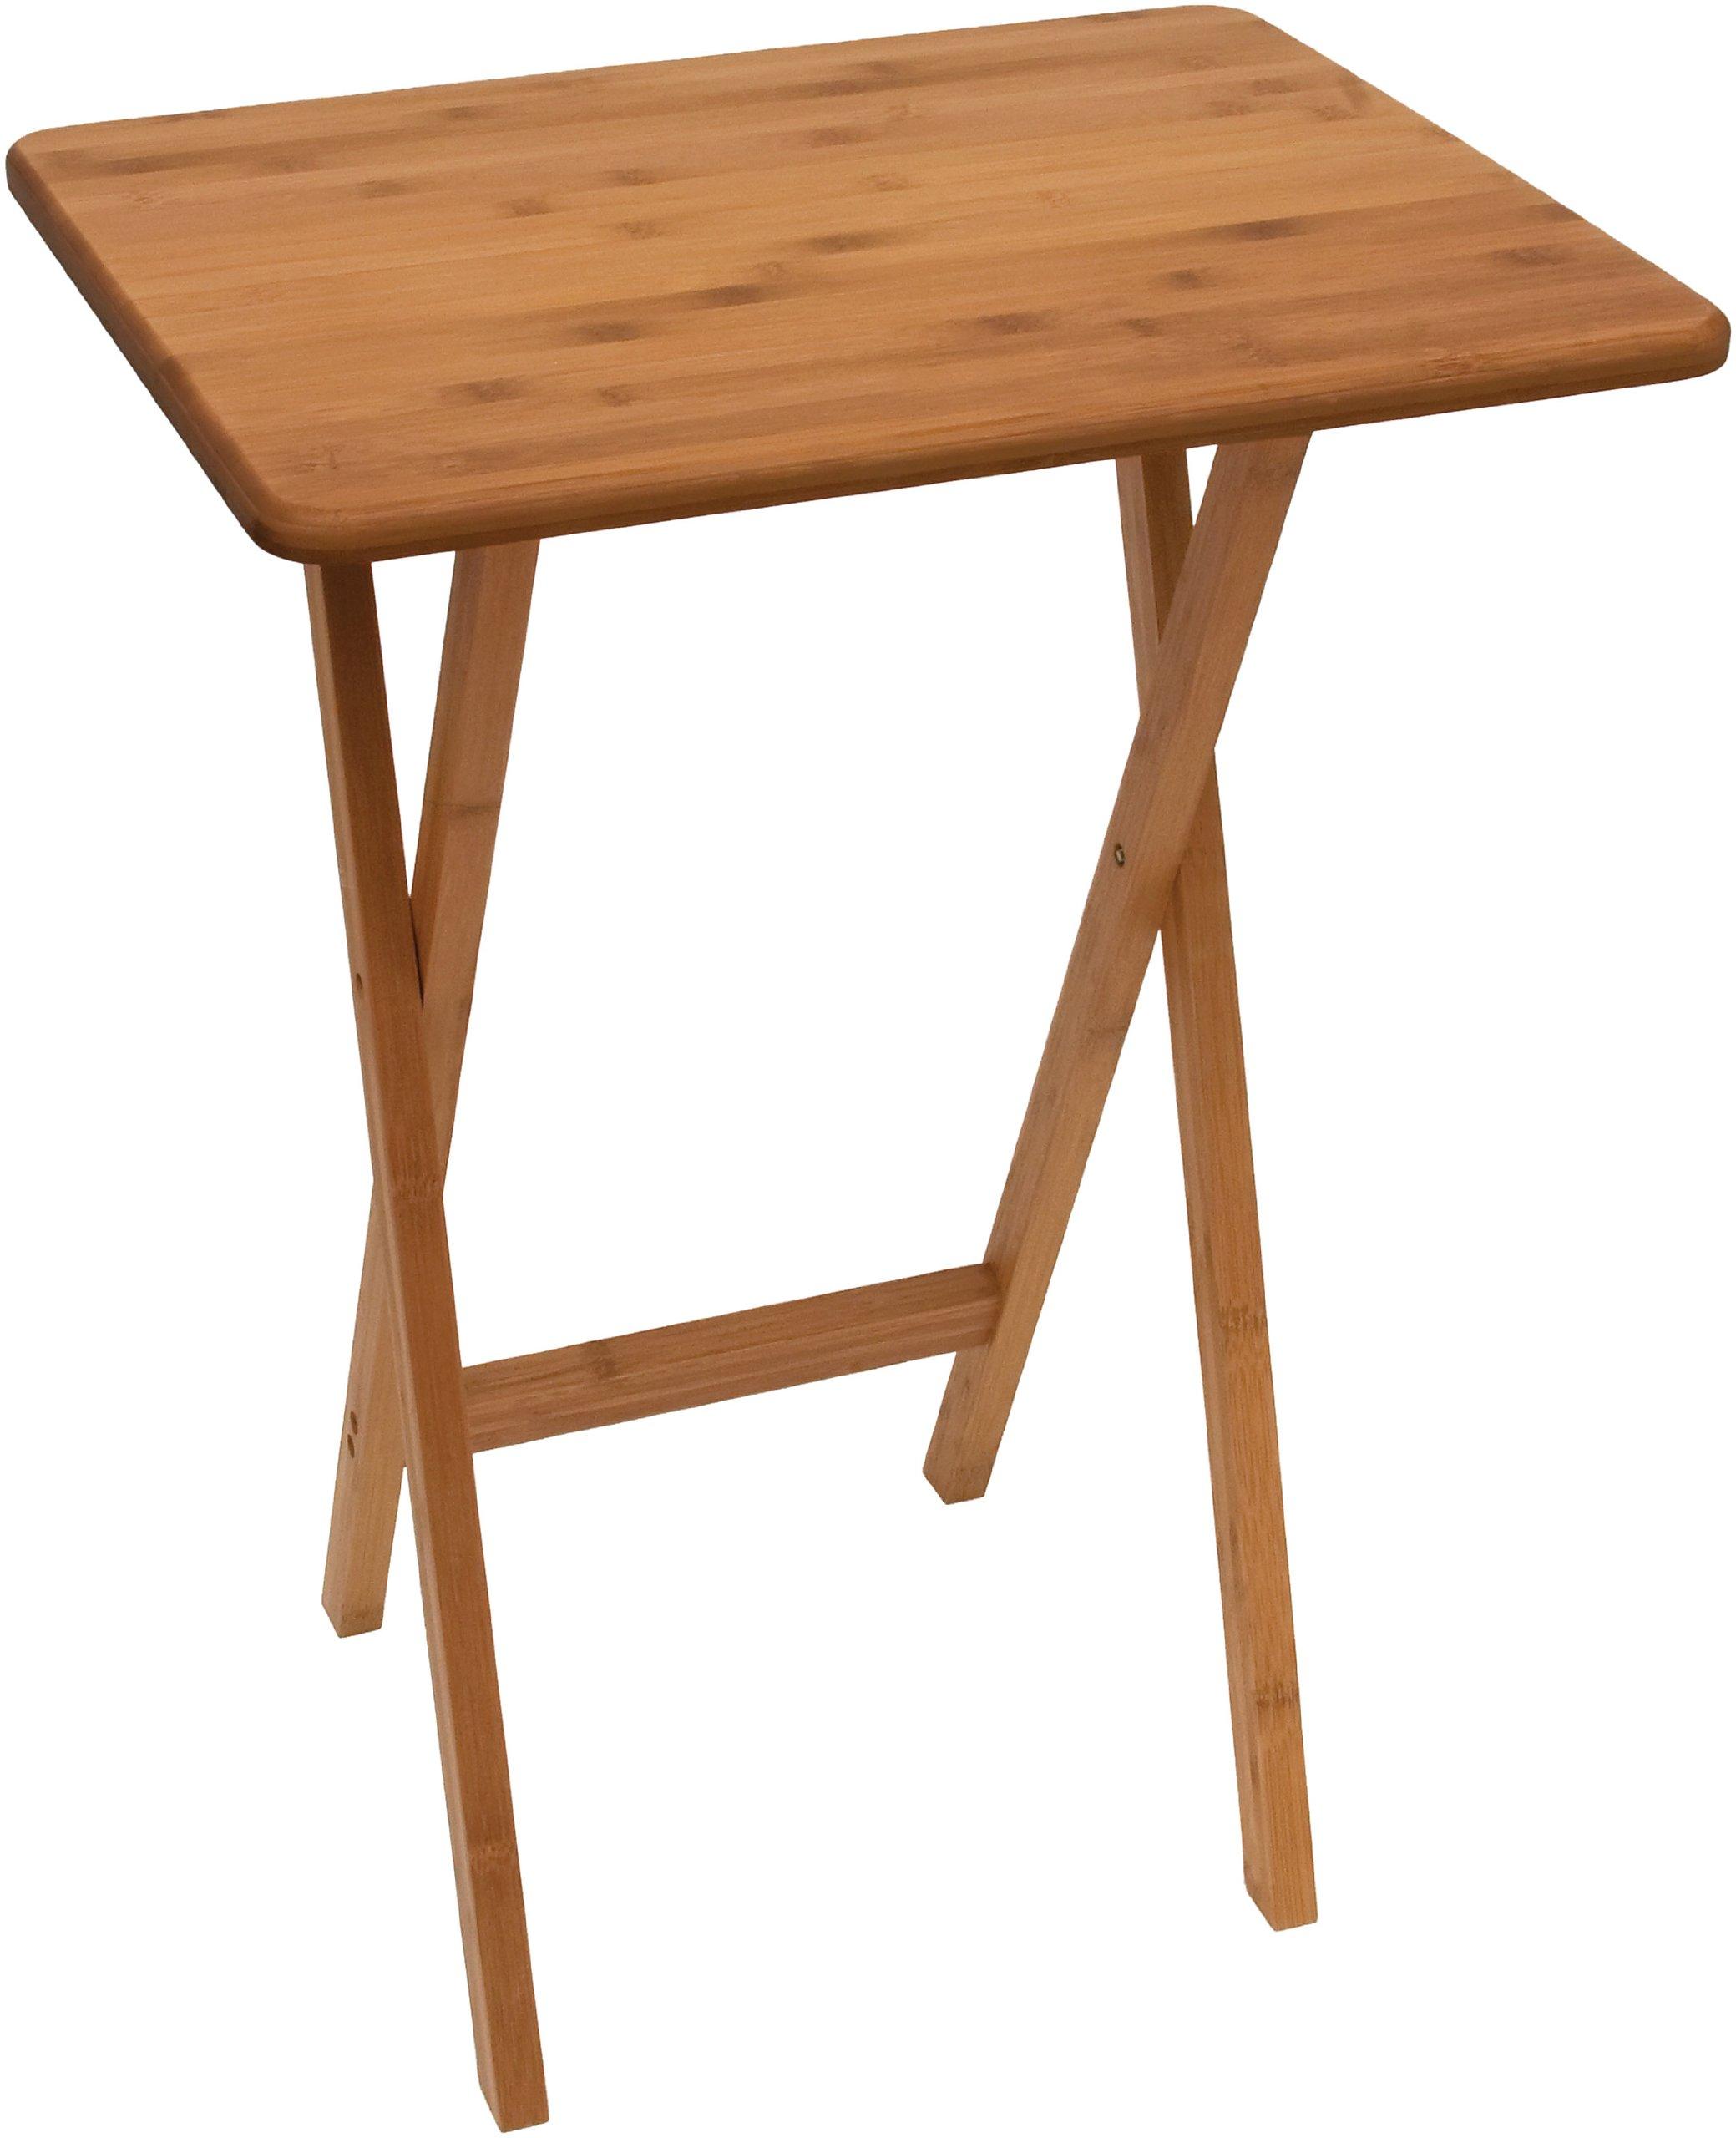 Lipper International 803 Bamboo Wood Rectangular Snack Table, 18.75'' x 15'' x 24.75'', One Table